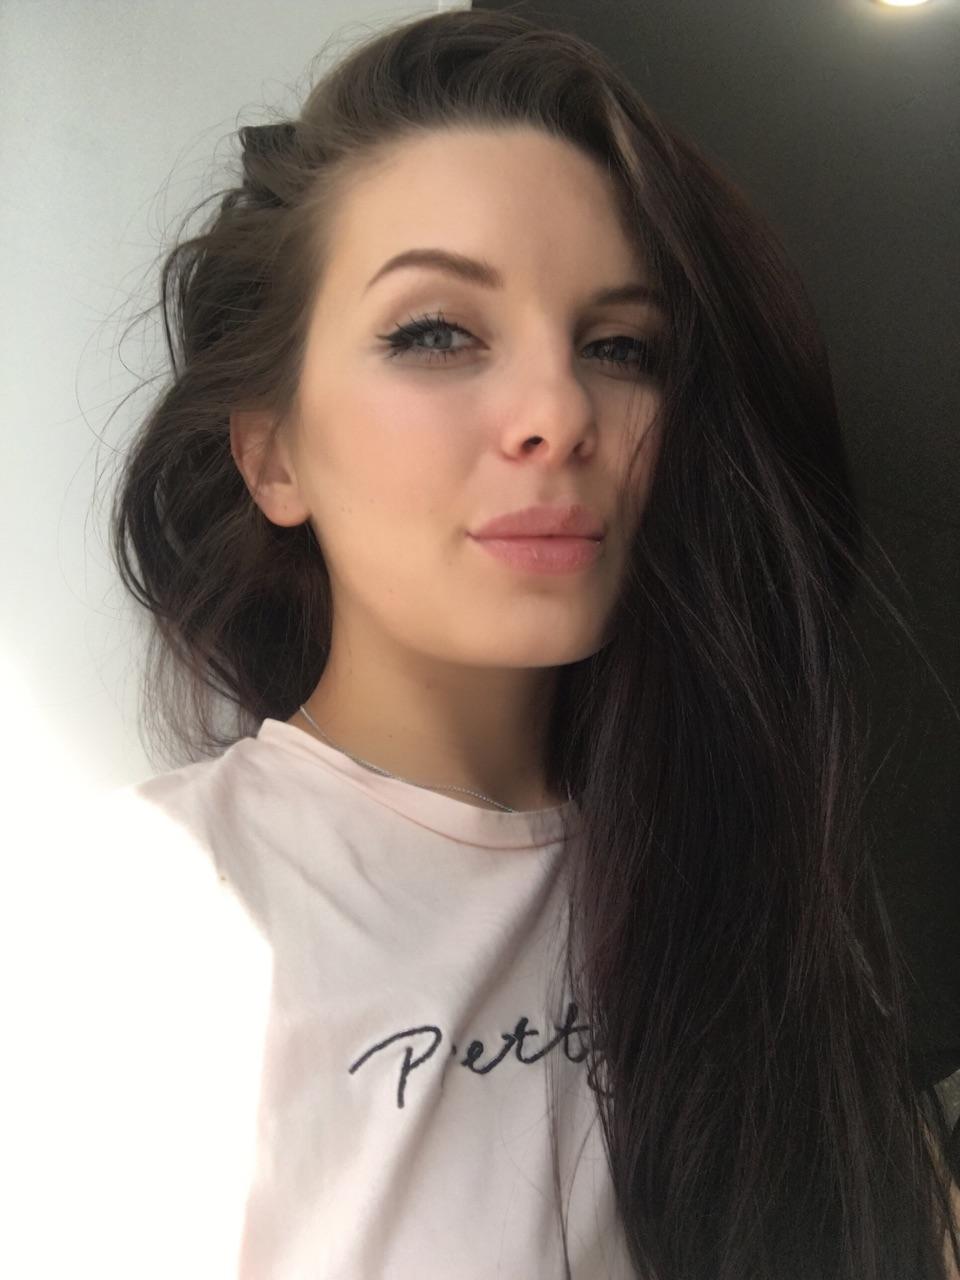 _Alekseevna_ 1